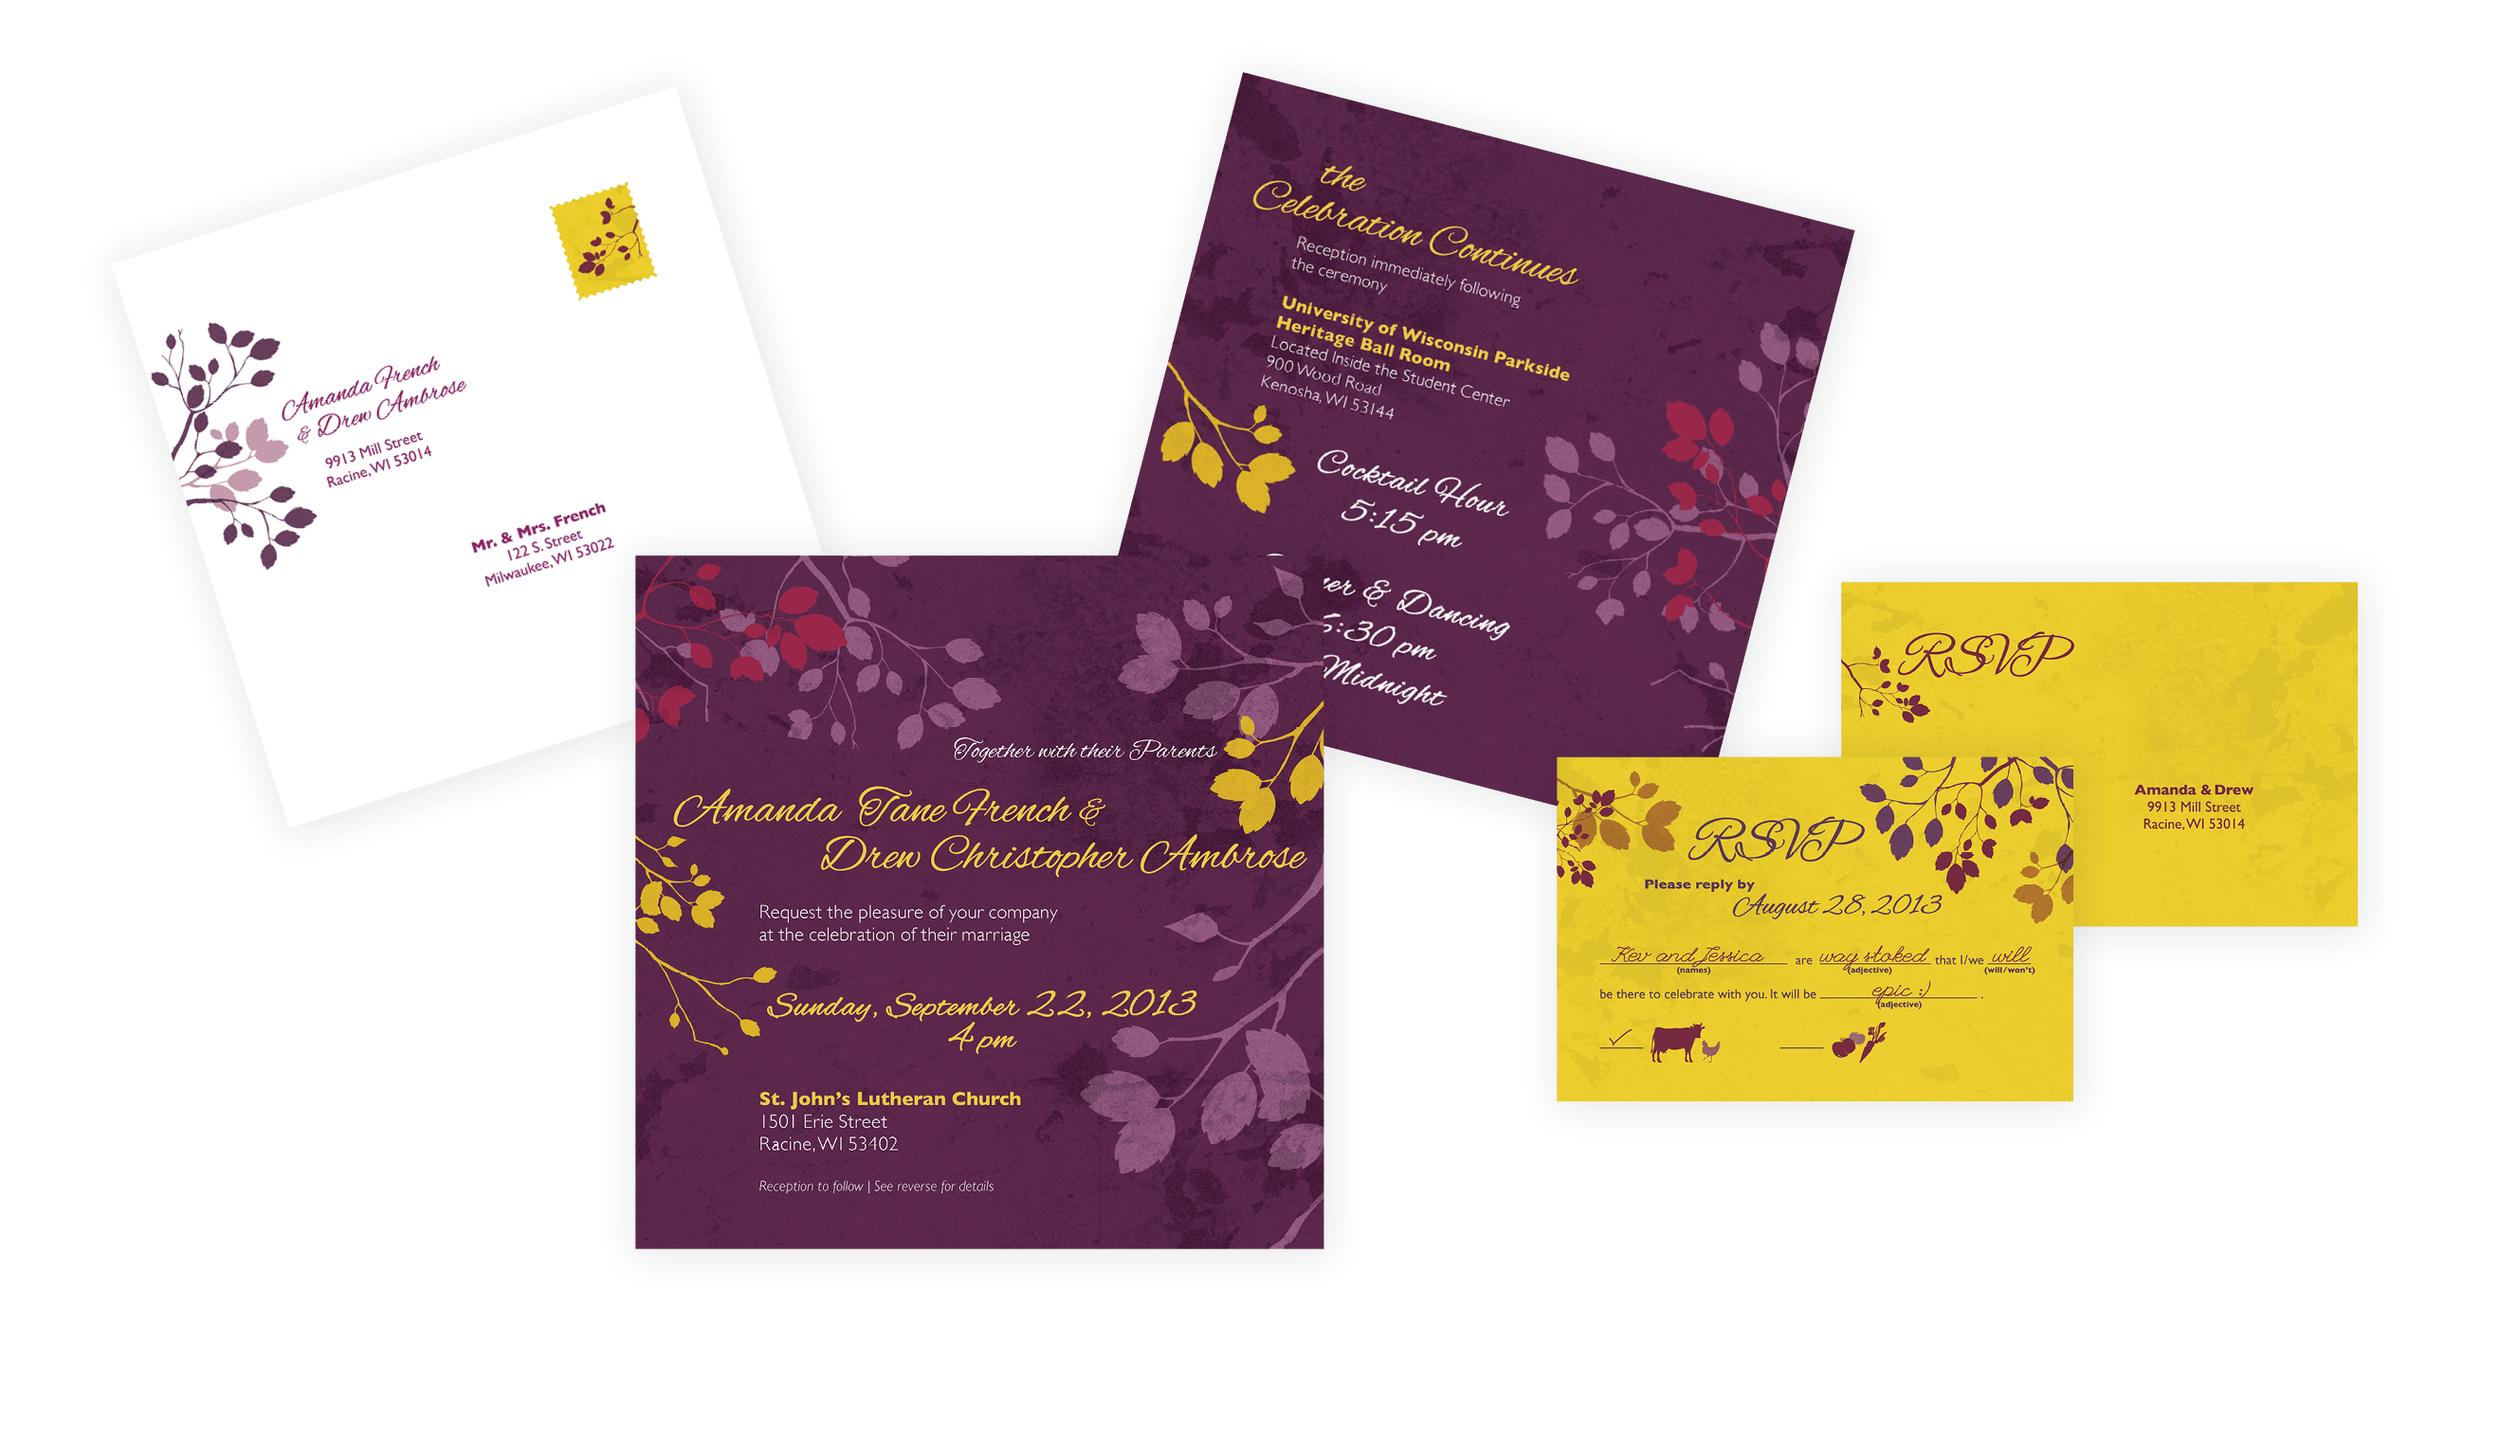 SchumannStudioCreative_WeddingInvitations_23.png